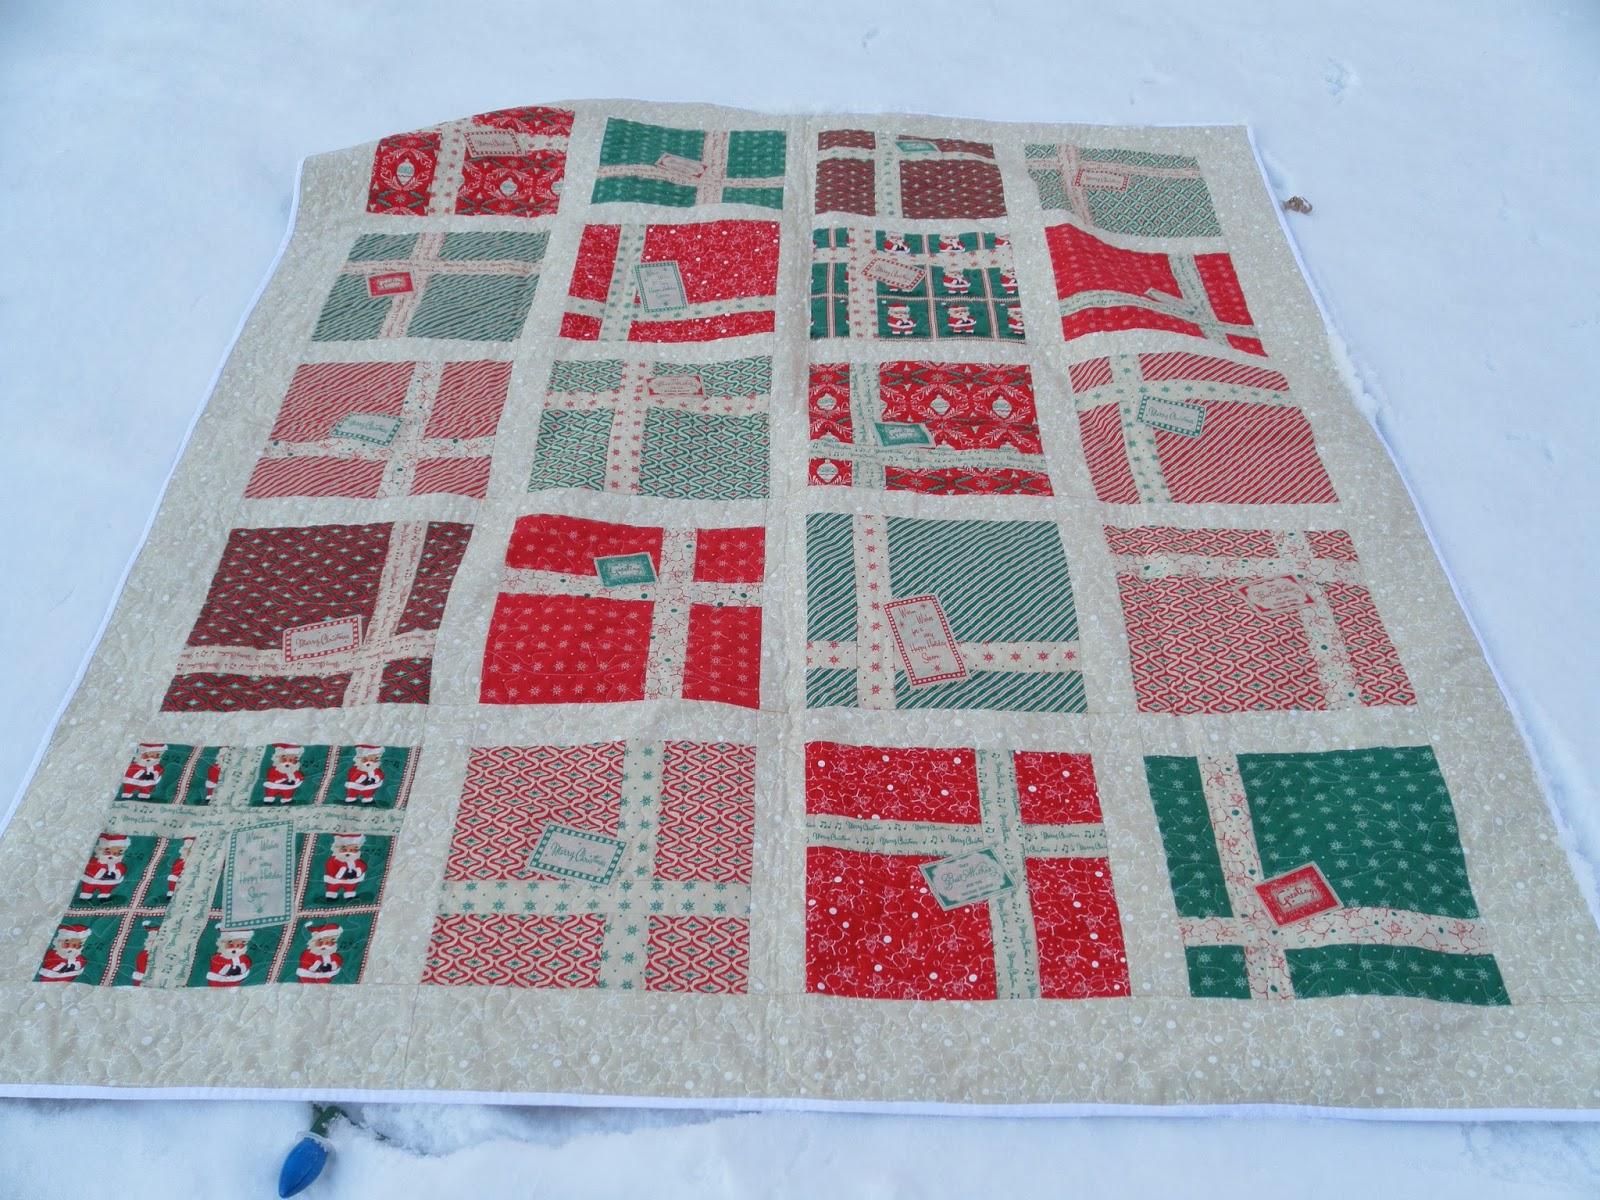 sage november sews: Christmas Gifts Quilt